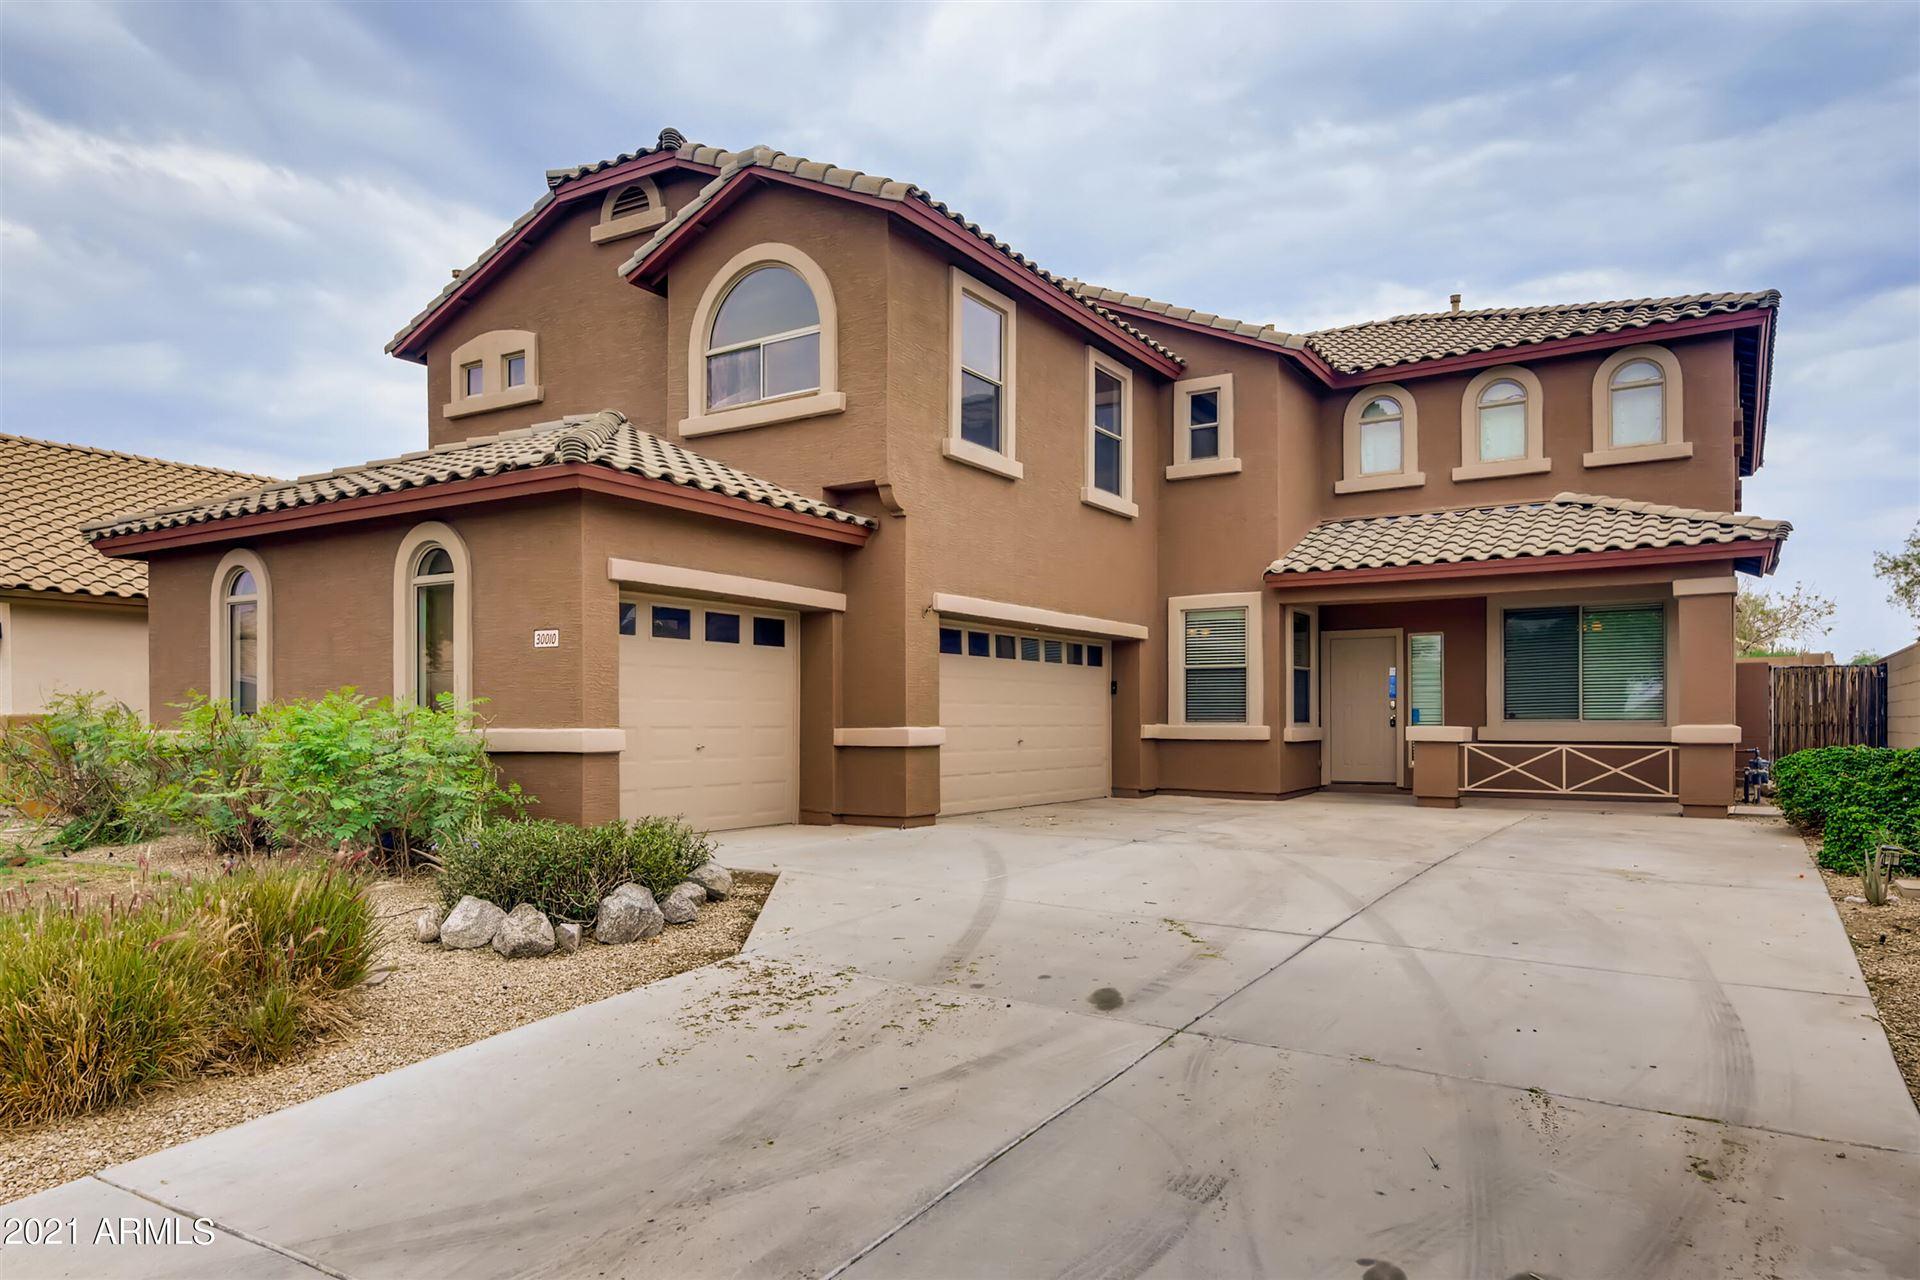 30010 N SEDONA Place, San Tan Valley, AZ 85143 - MLS#: 6267571